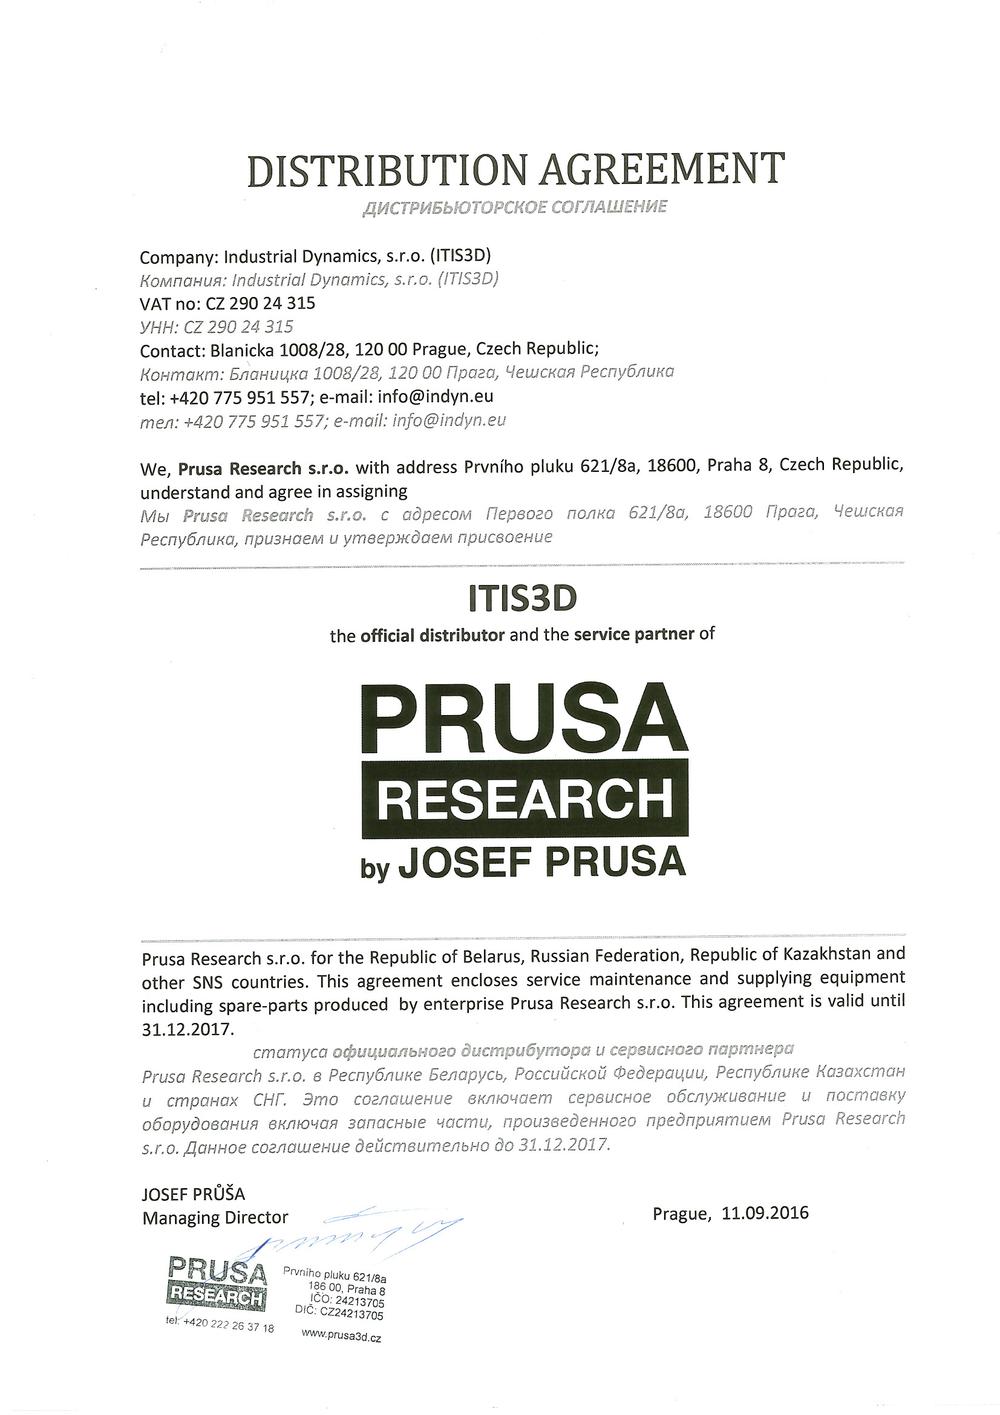 itis3d distribution Prusa signed.png